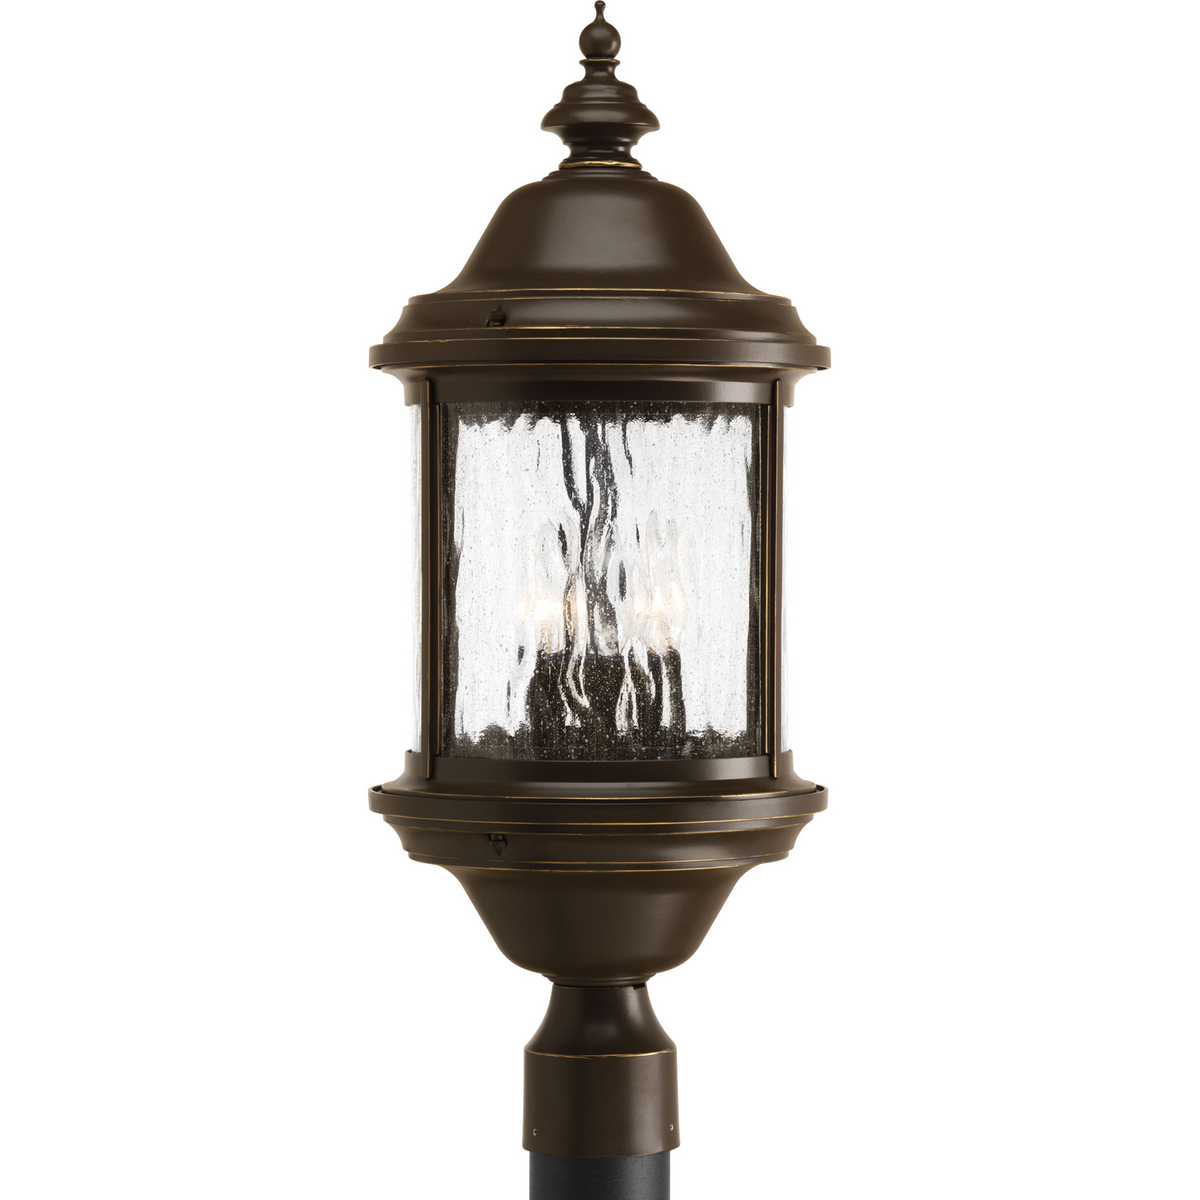 PRO P5450-20 3X60C Antique Bronze Water Seeded Glass Post Light